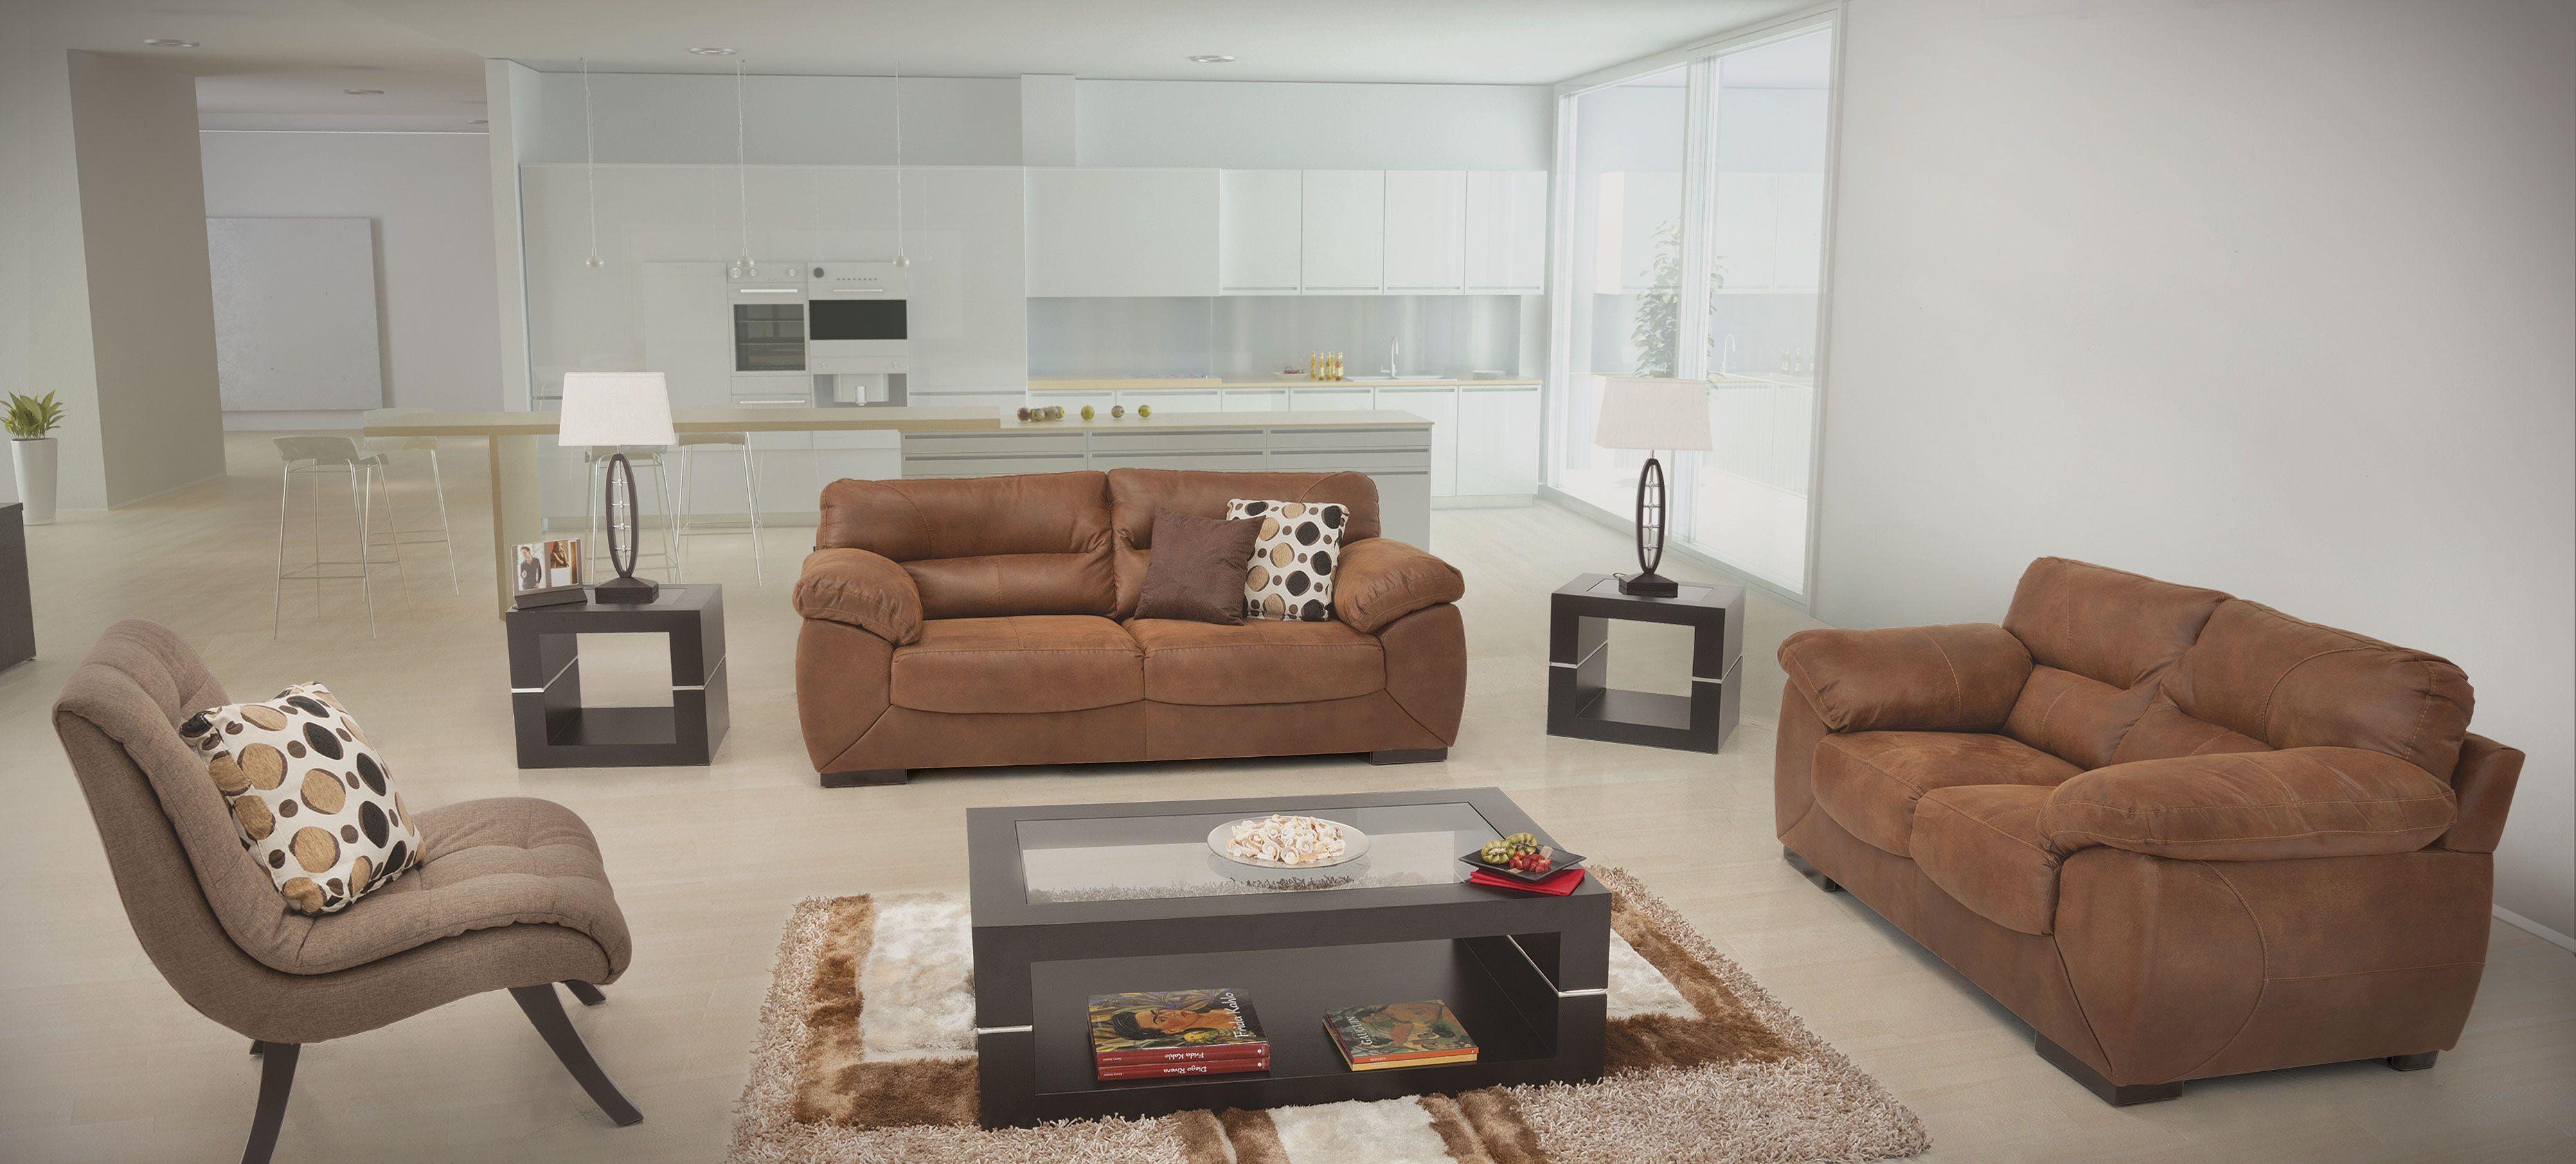 Sala Moka Gamuzza Bonded De Placencia Muebles House Pinterest  # Muebles Placencia